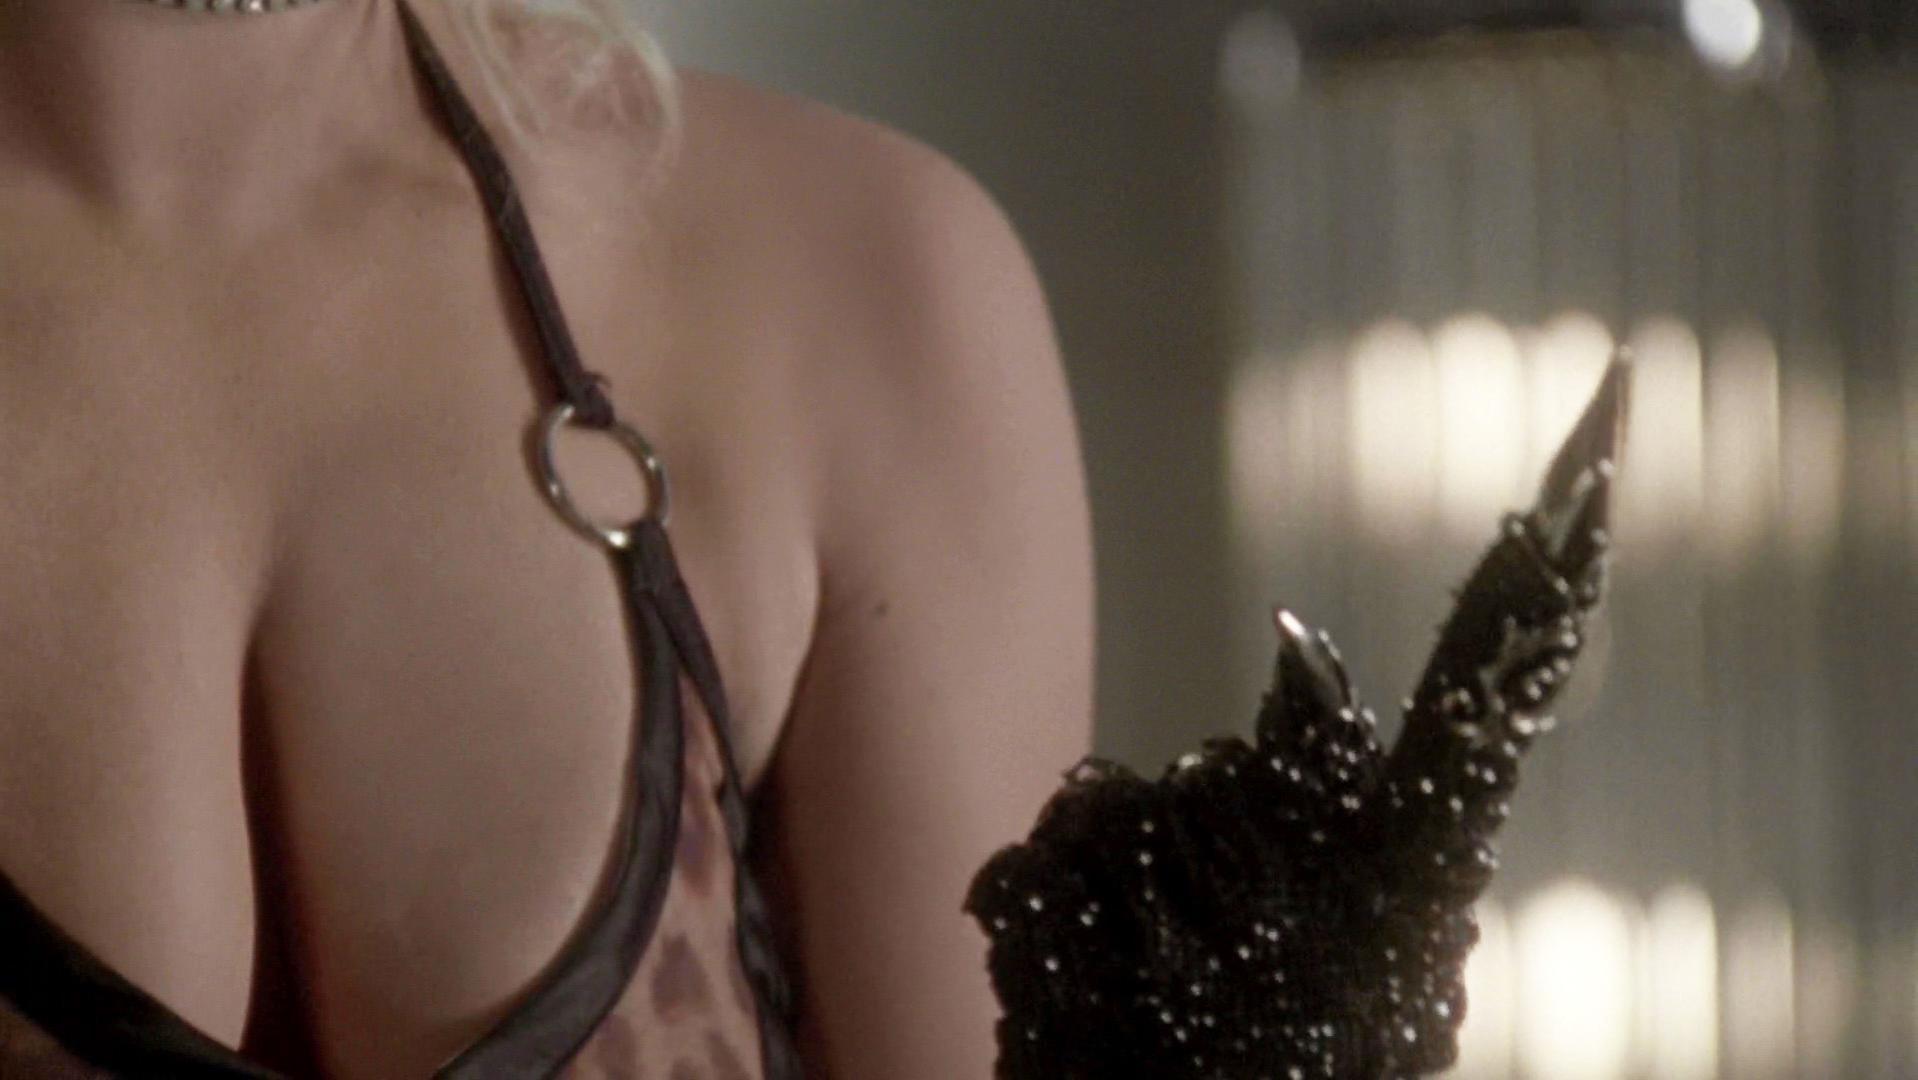 Angela Bassett Nude Pics nude video celebs » lady gaga sexy, angela bassett sexy